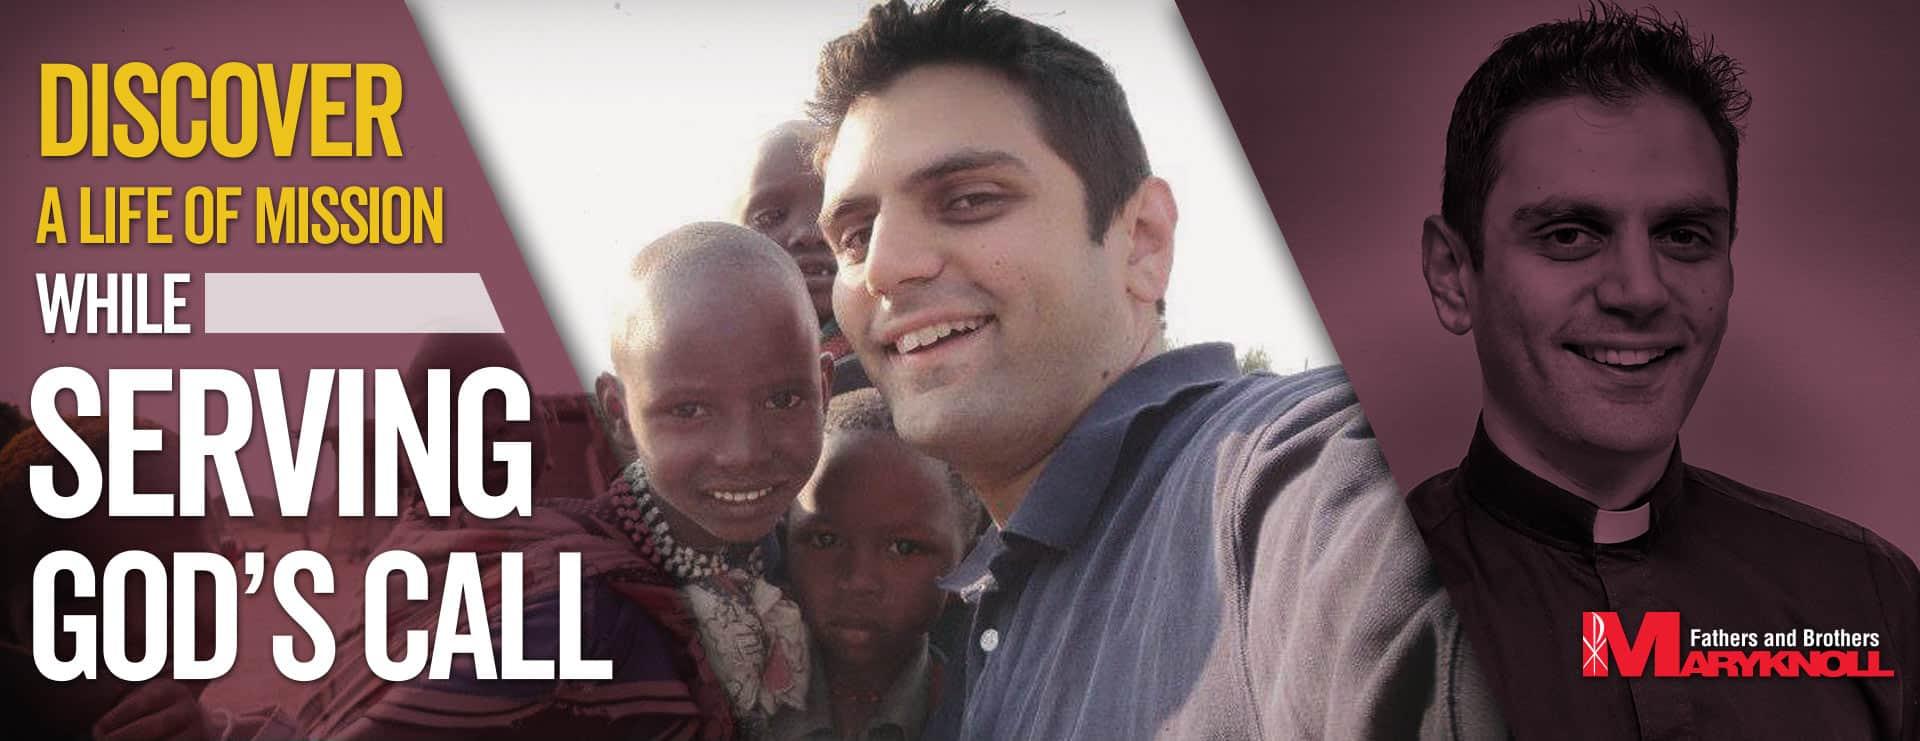 Vocation as an Overseas Missionary - Maryknoll